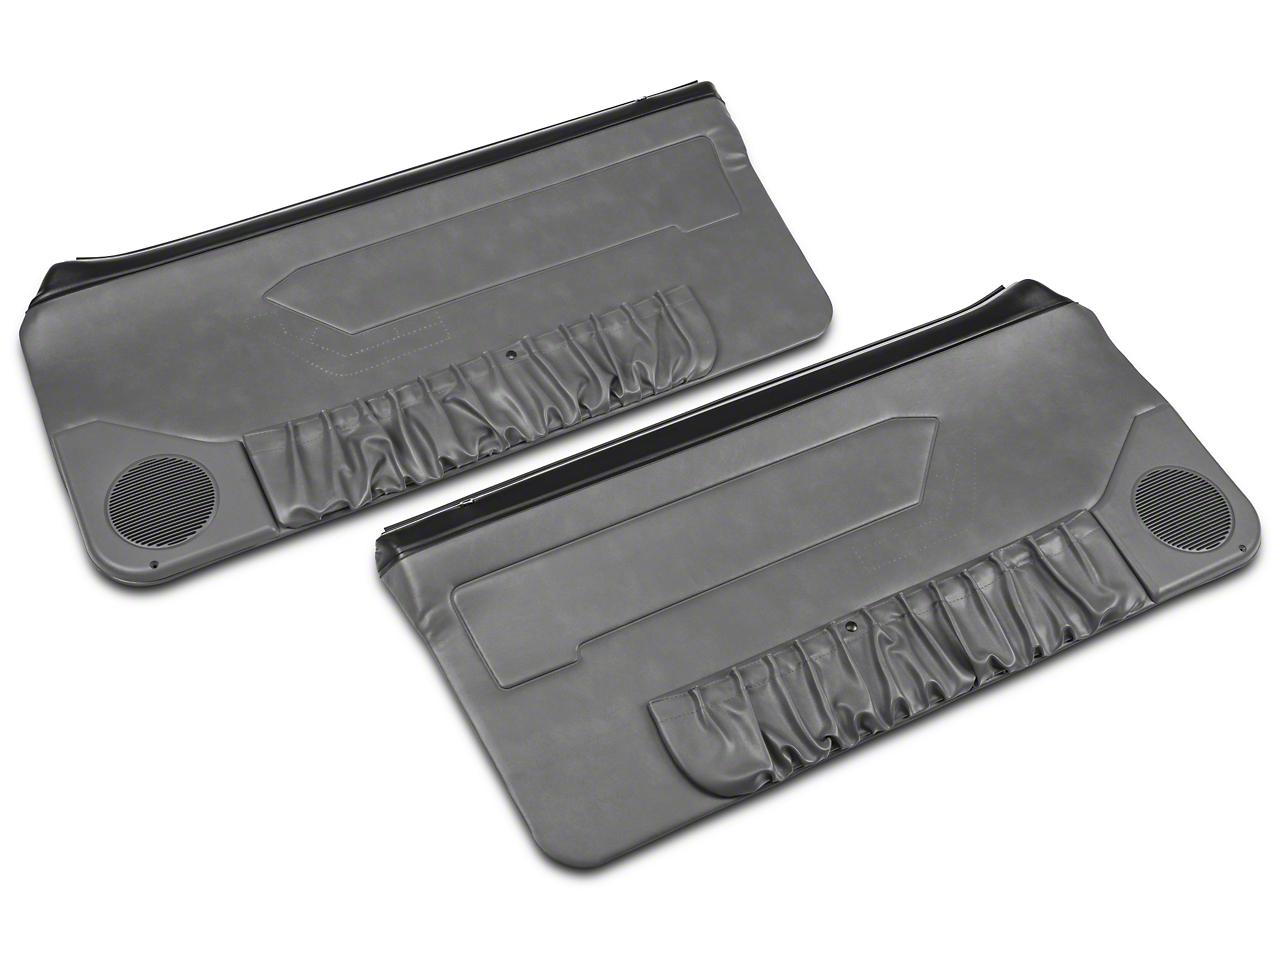 OPR Convertible Door Panels for Manual Windows - Smoke Gray (87-93 All)